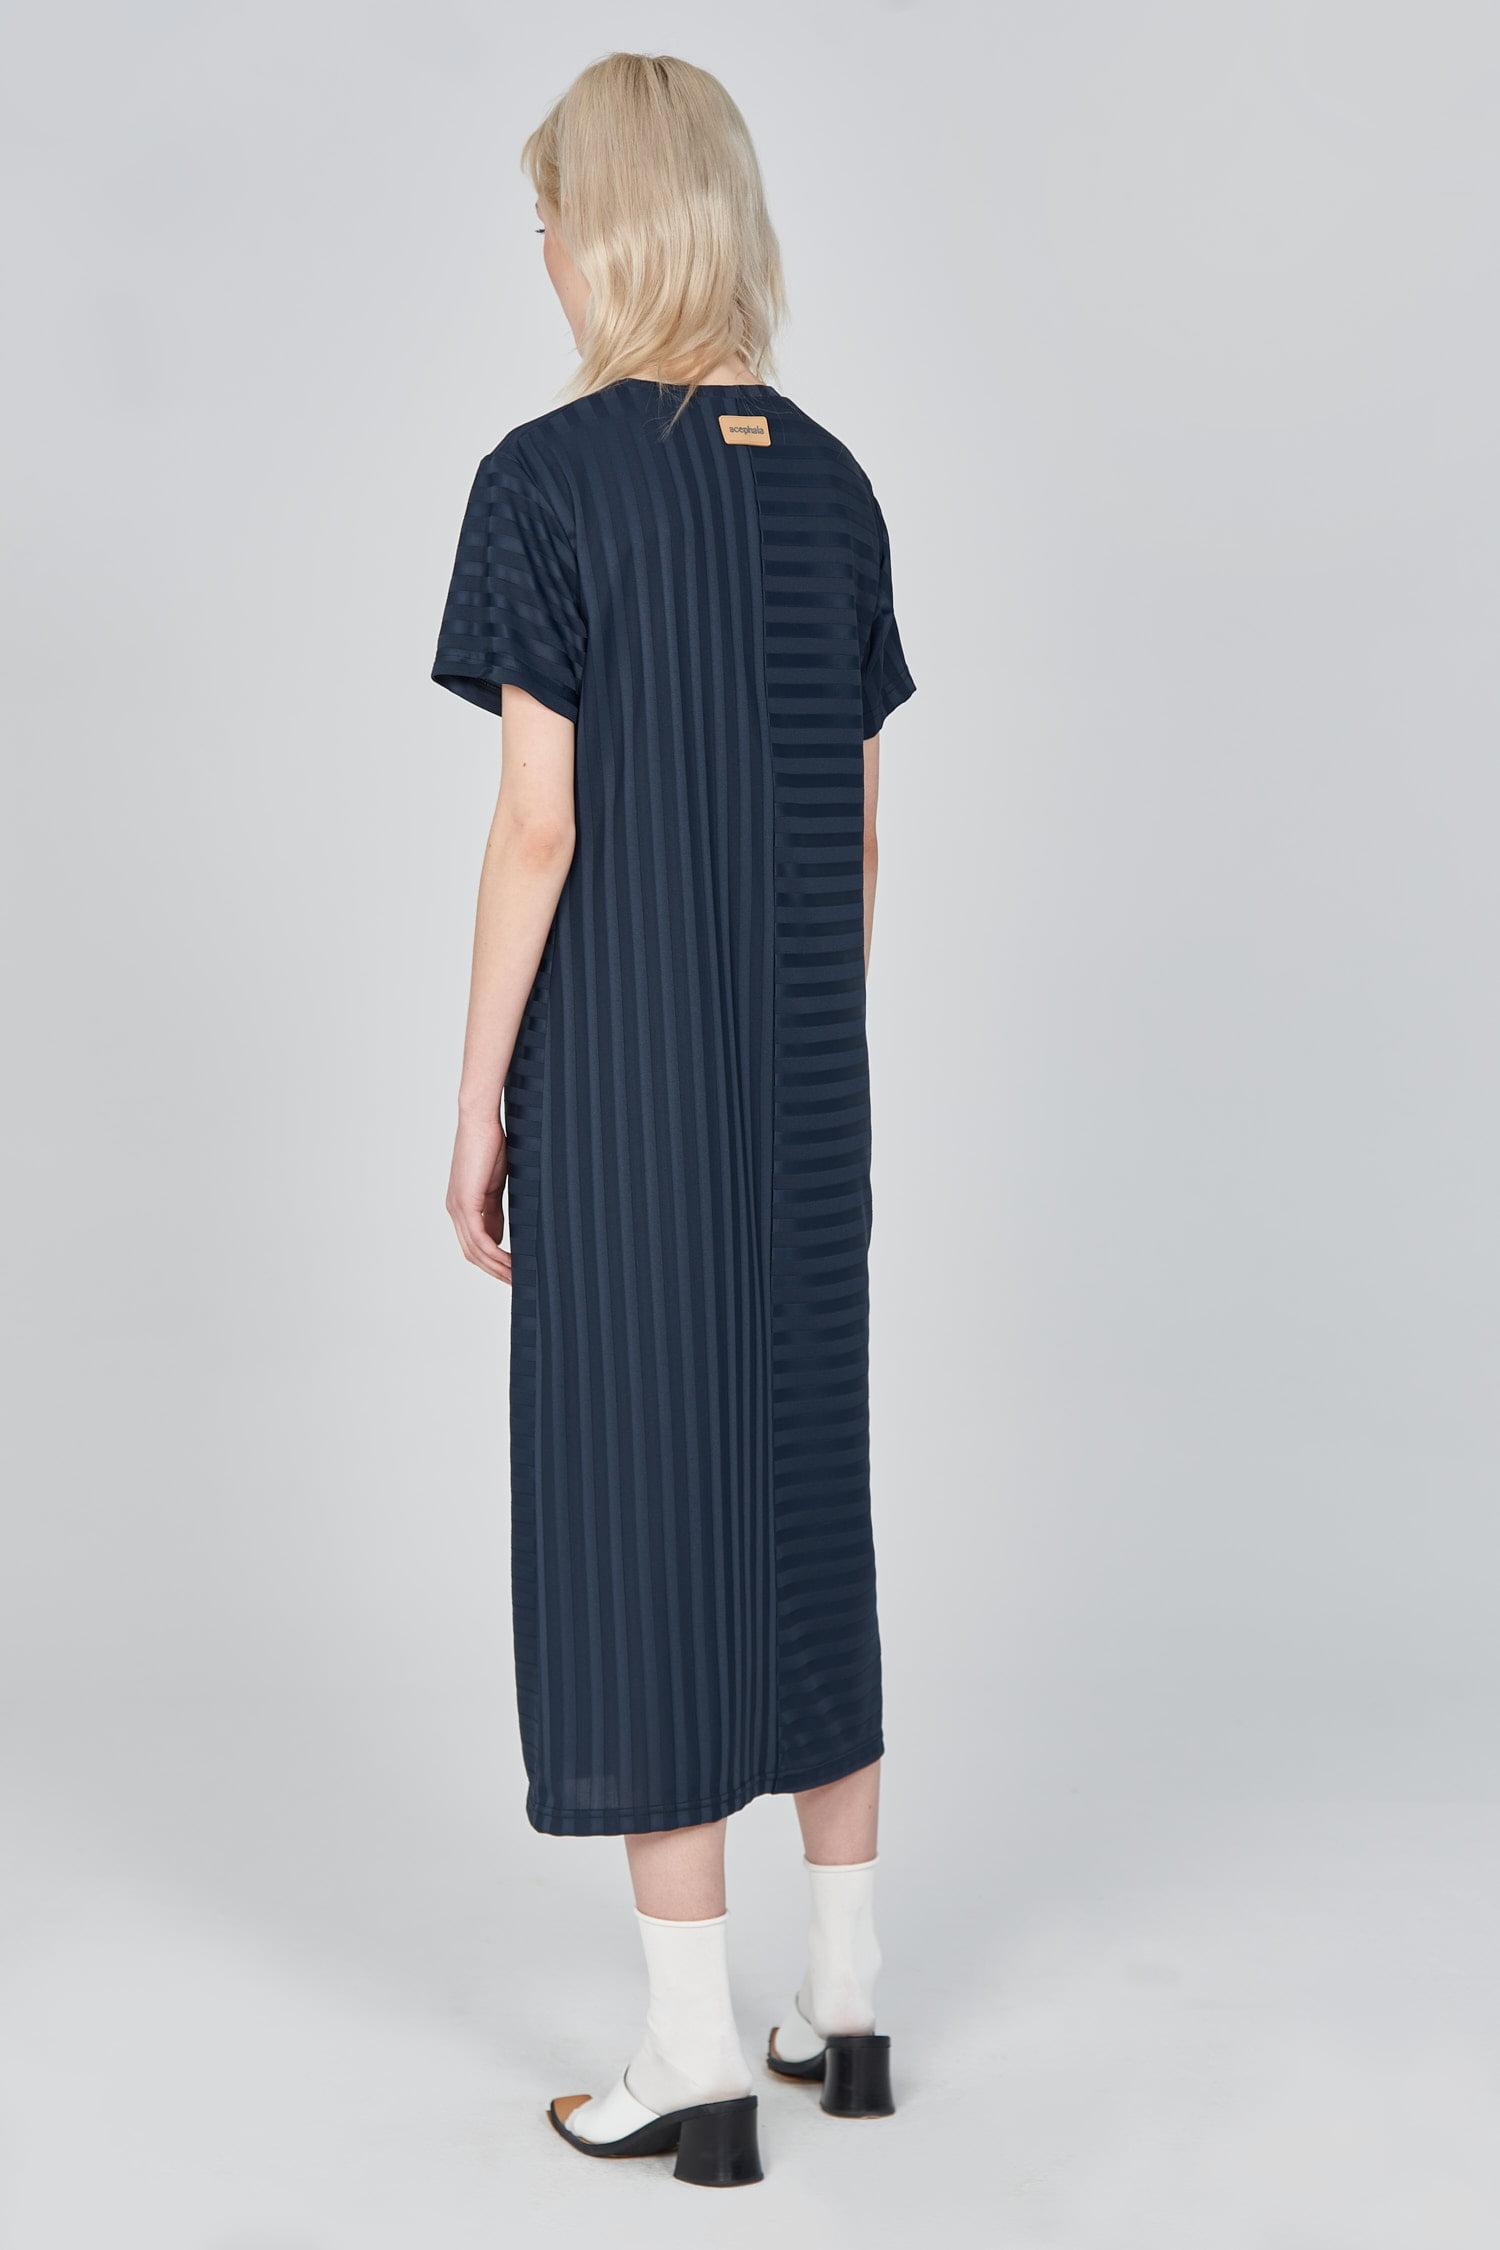 Acephala Ss21 Ribbed T Shirt Dress Back Side